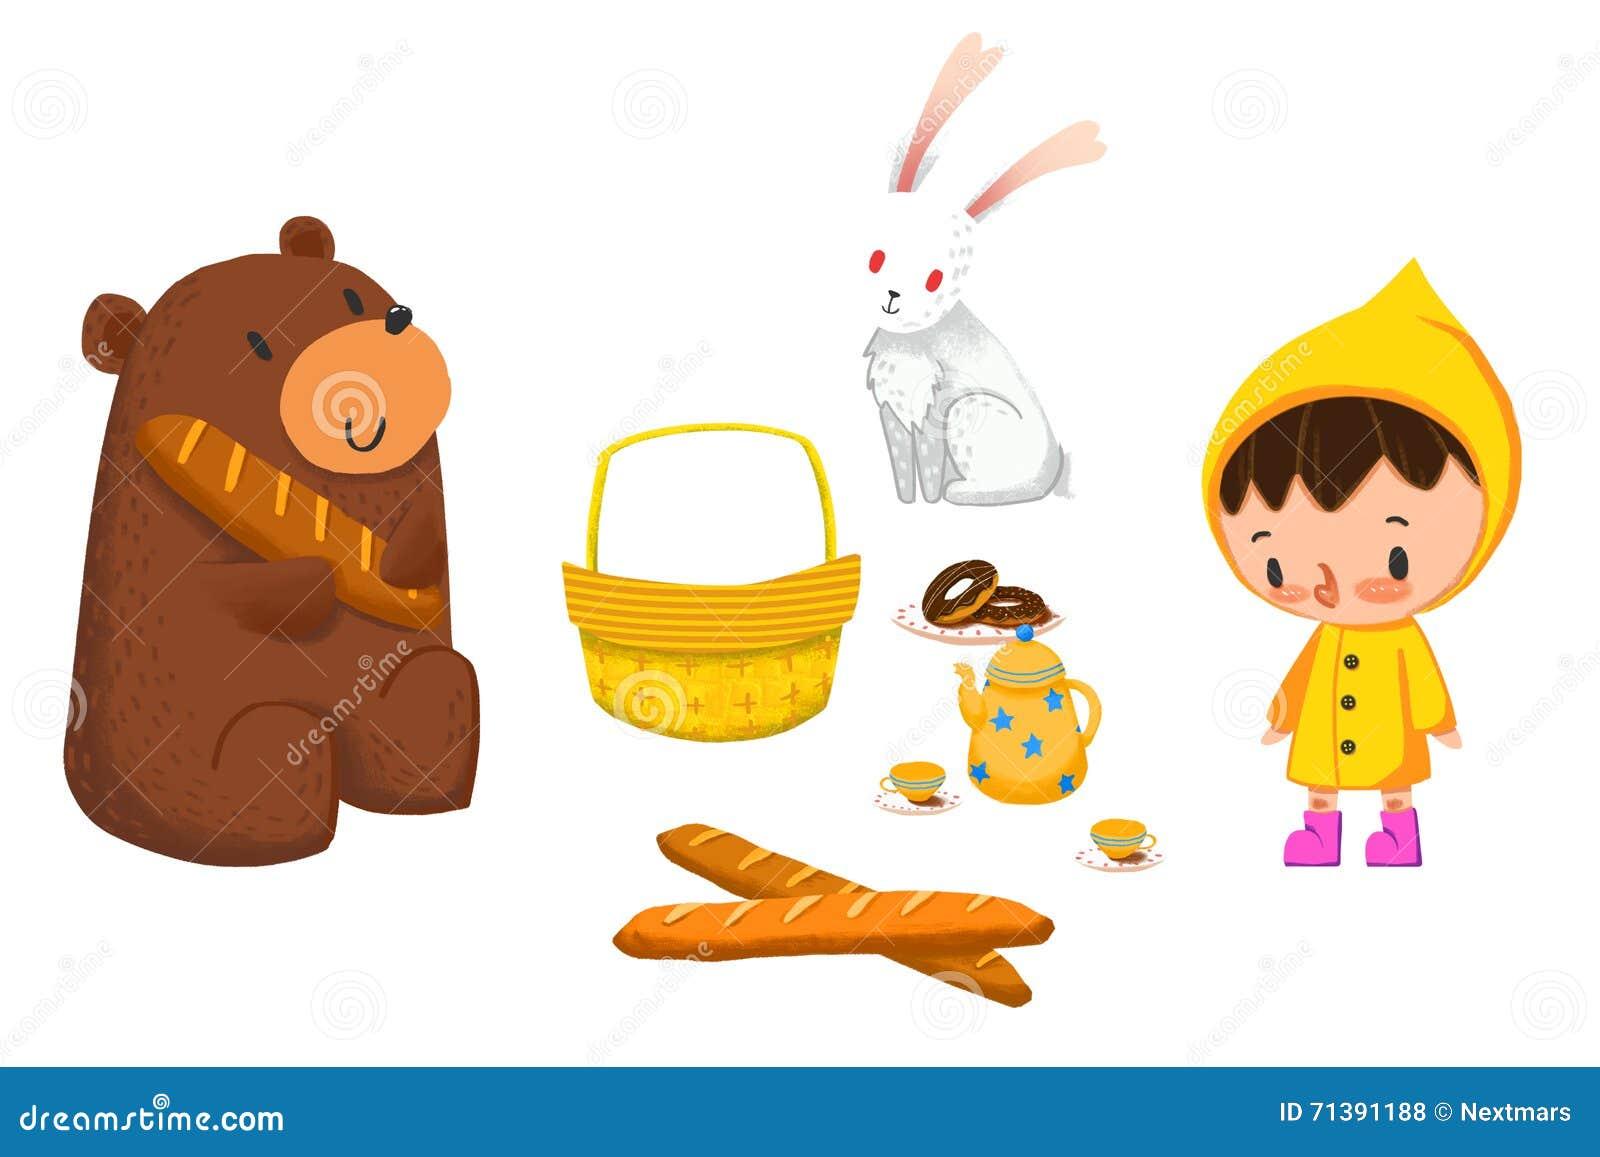 Clip Art Set Animal Food And Kid Stock Illustration Illustration Of Artwork Boot 71391188